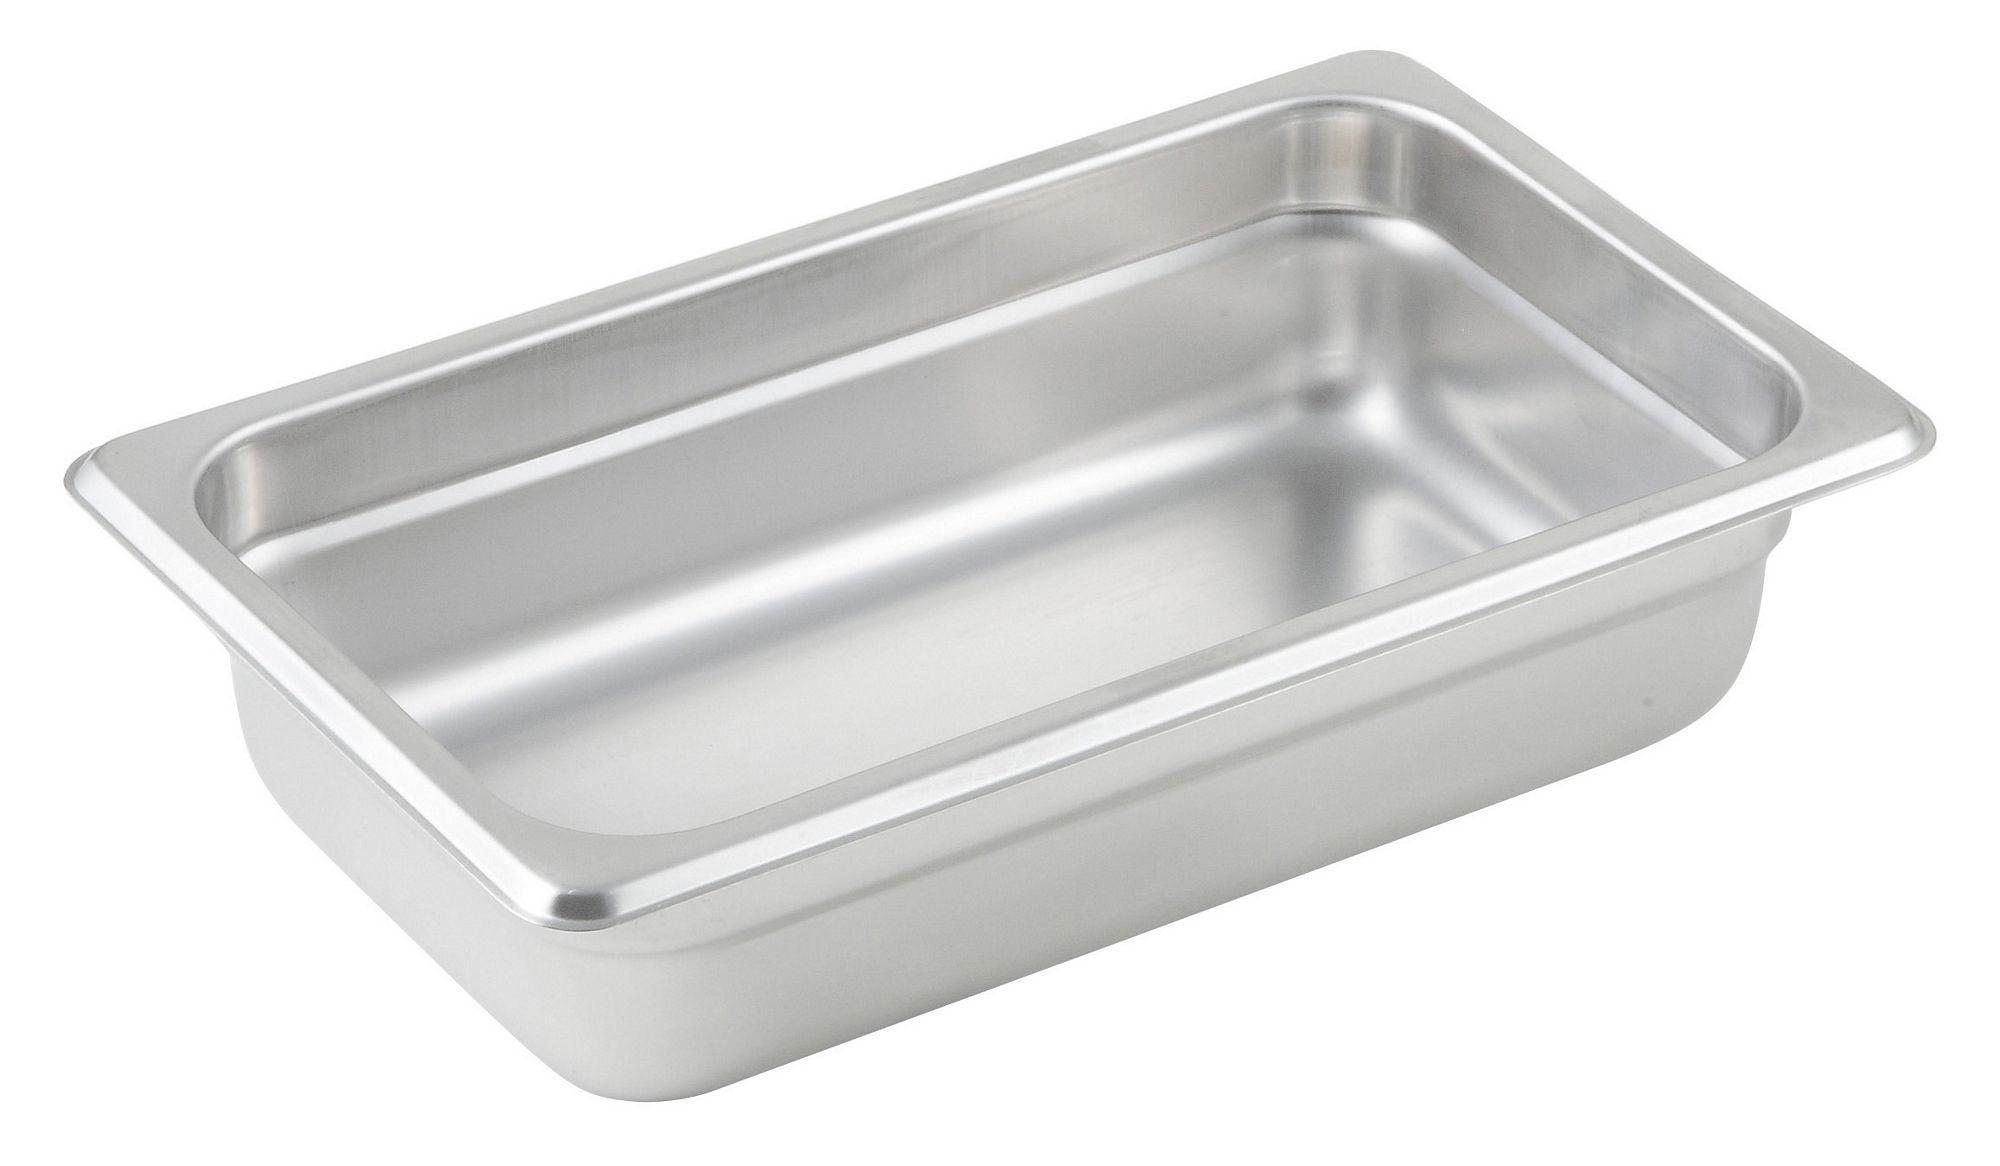 "Winco SPJL-402 1/4 Size Anti-Jam 25 Gauge Steam Table Pan 2-1/2"" Deep"